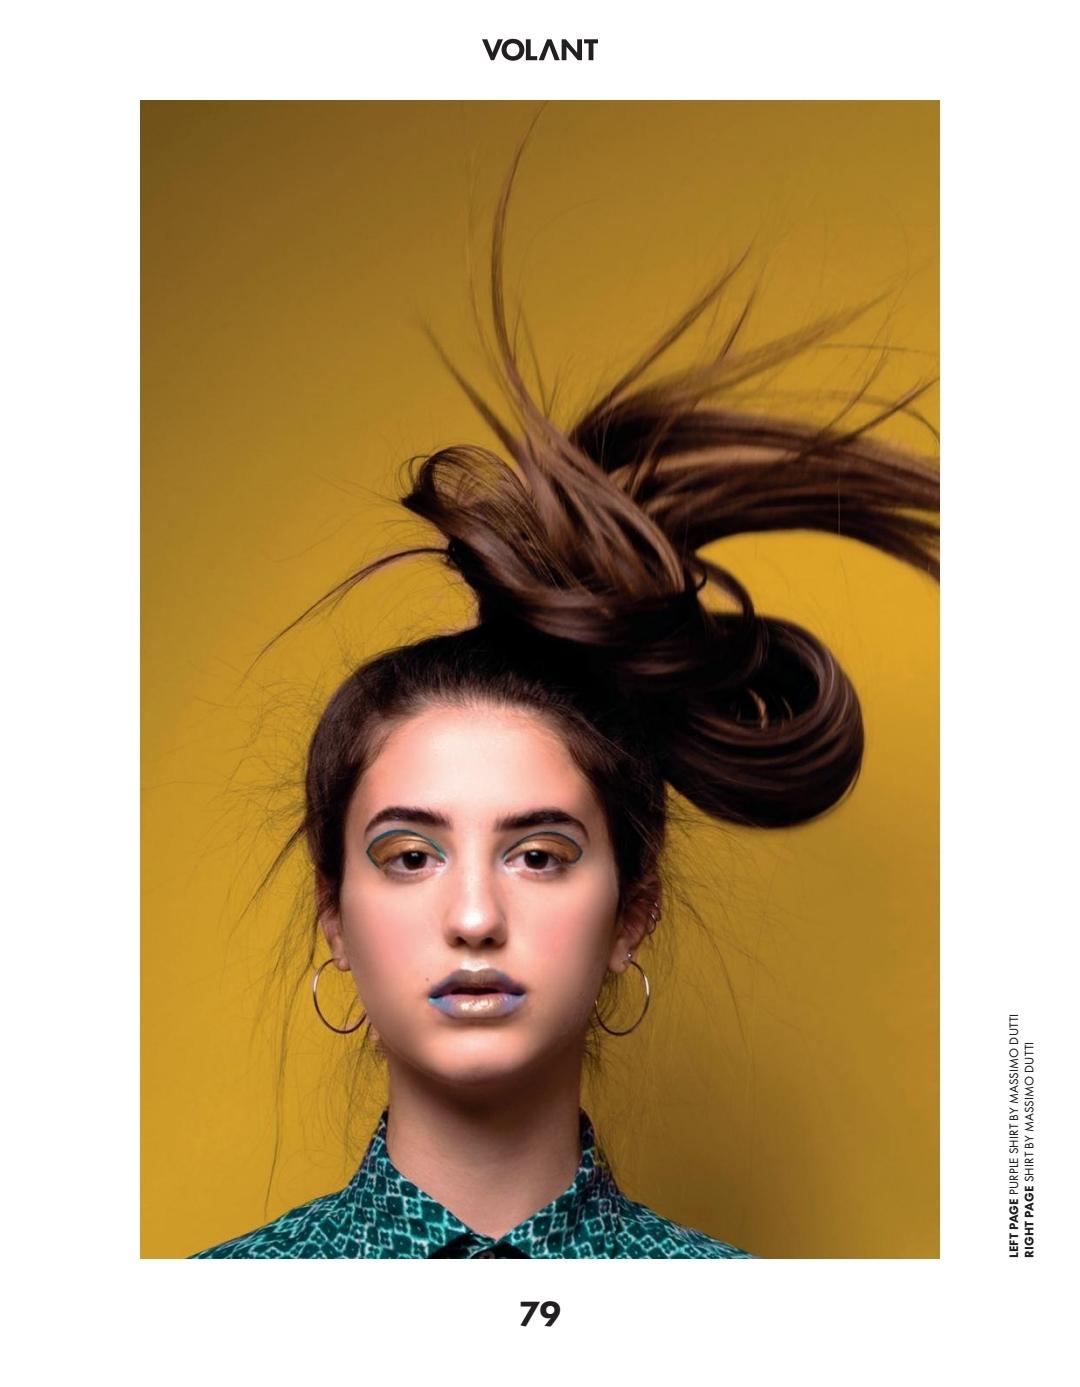 [Model: Sara Geha]